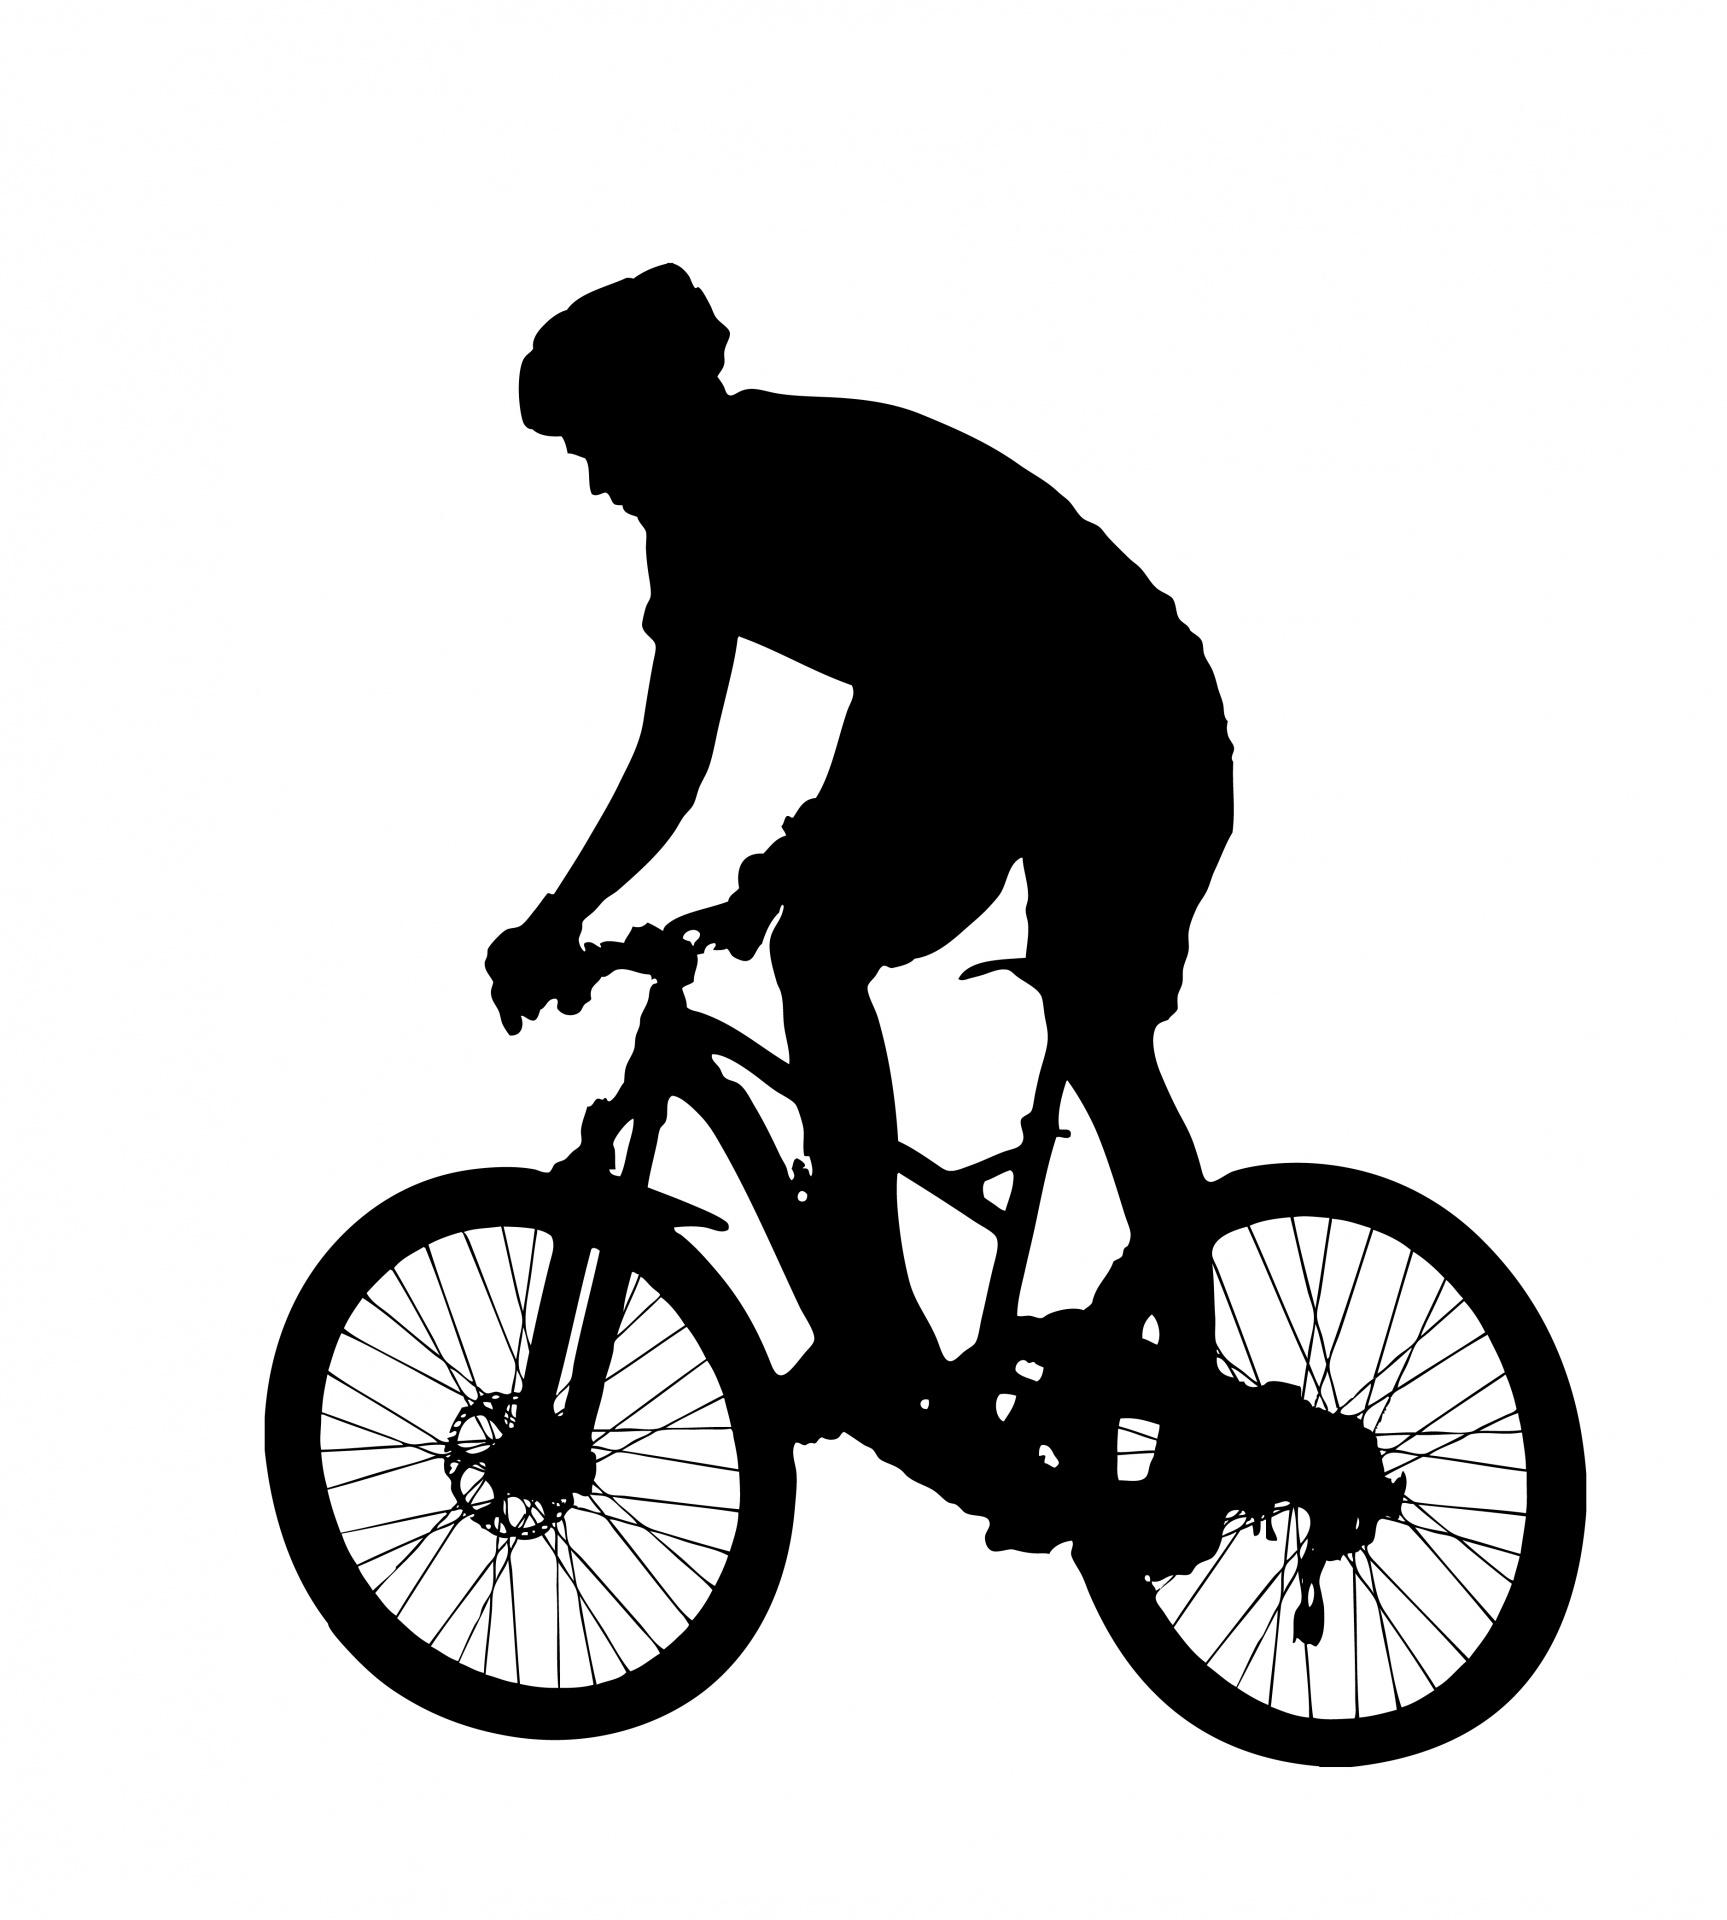 Mountain Bike Rider Silhouette Free Stock Photo - Public Domain Pictures